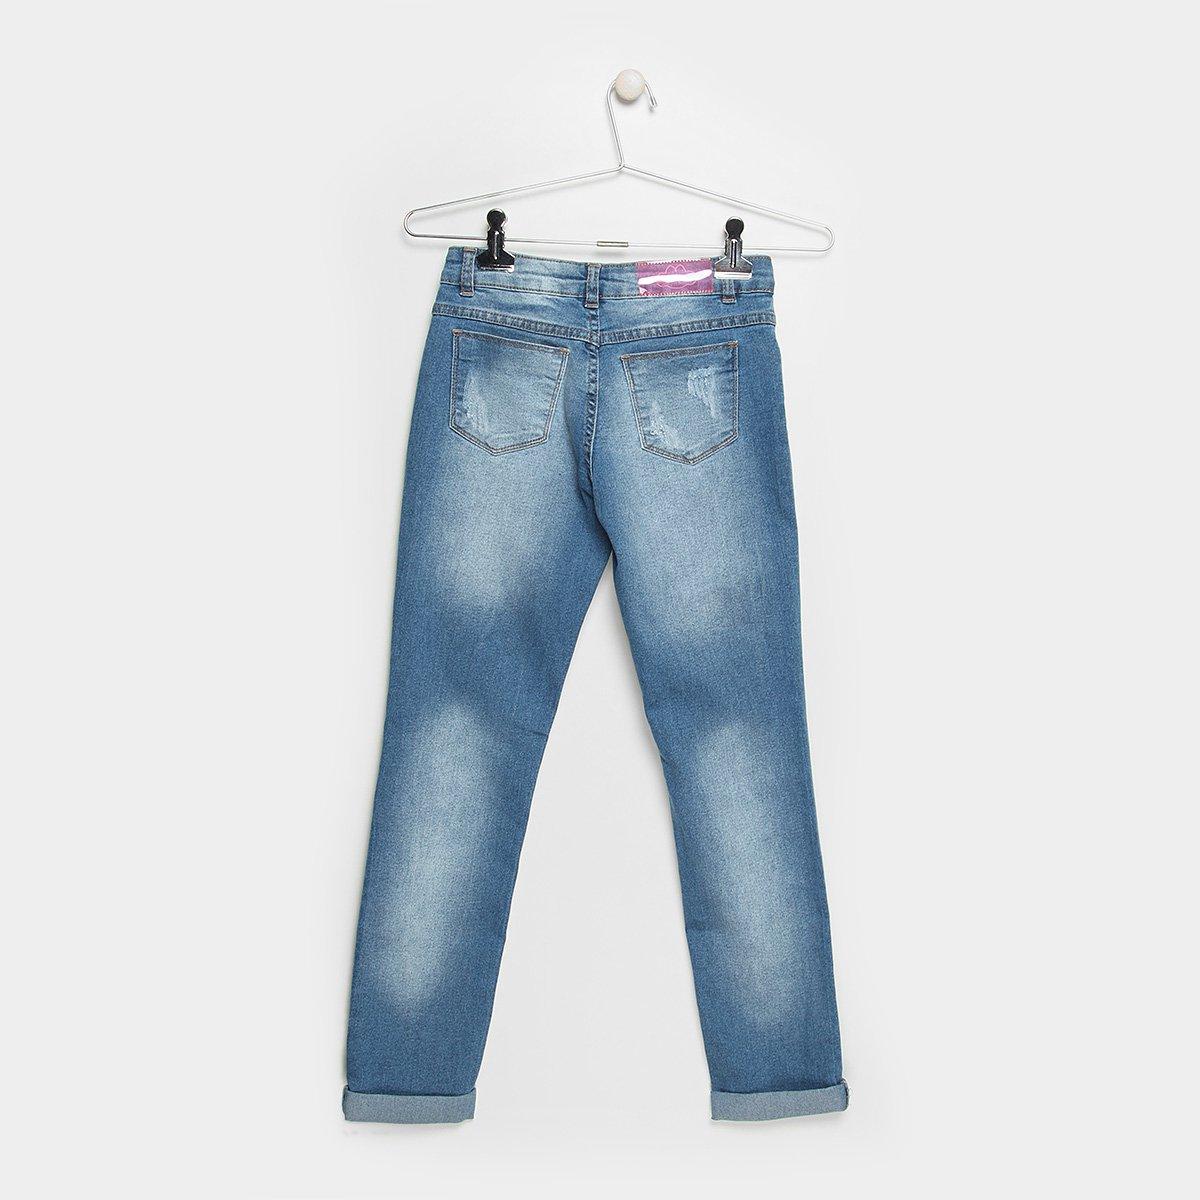 Ripilica Calça Feminina Jeans Jeans Desfiada Infantil Infantil Lilica Calça Estonada Azul zrYxzOq